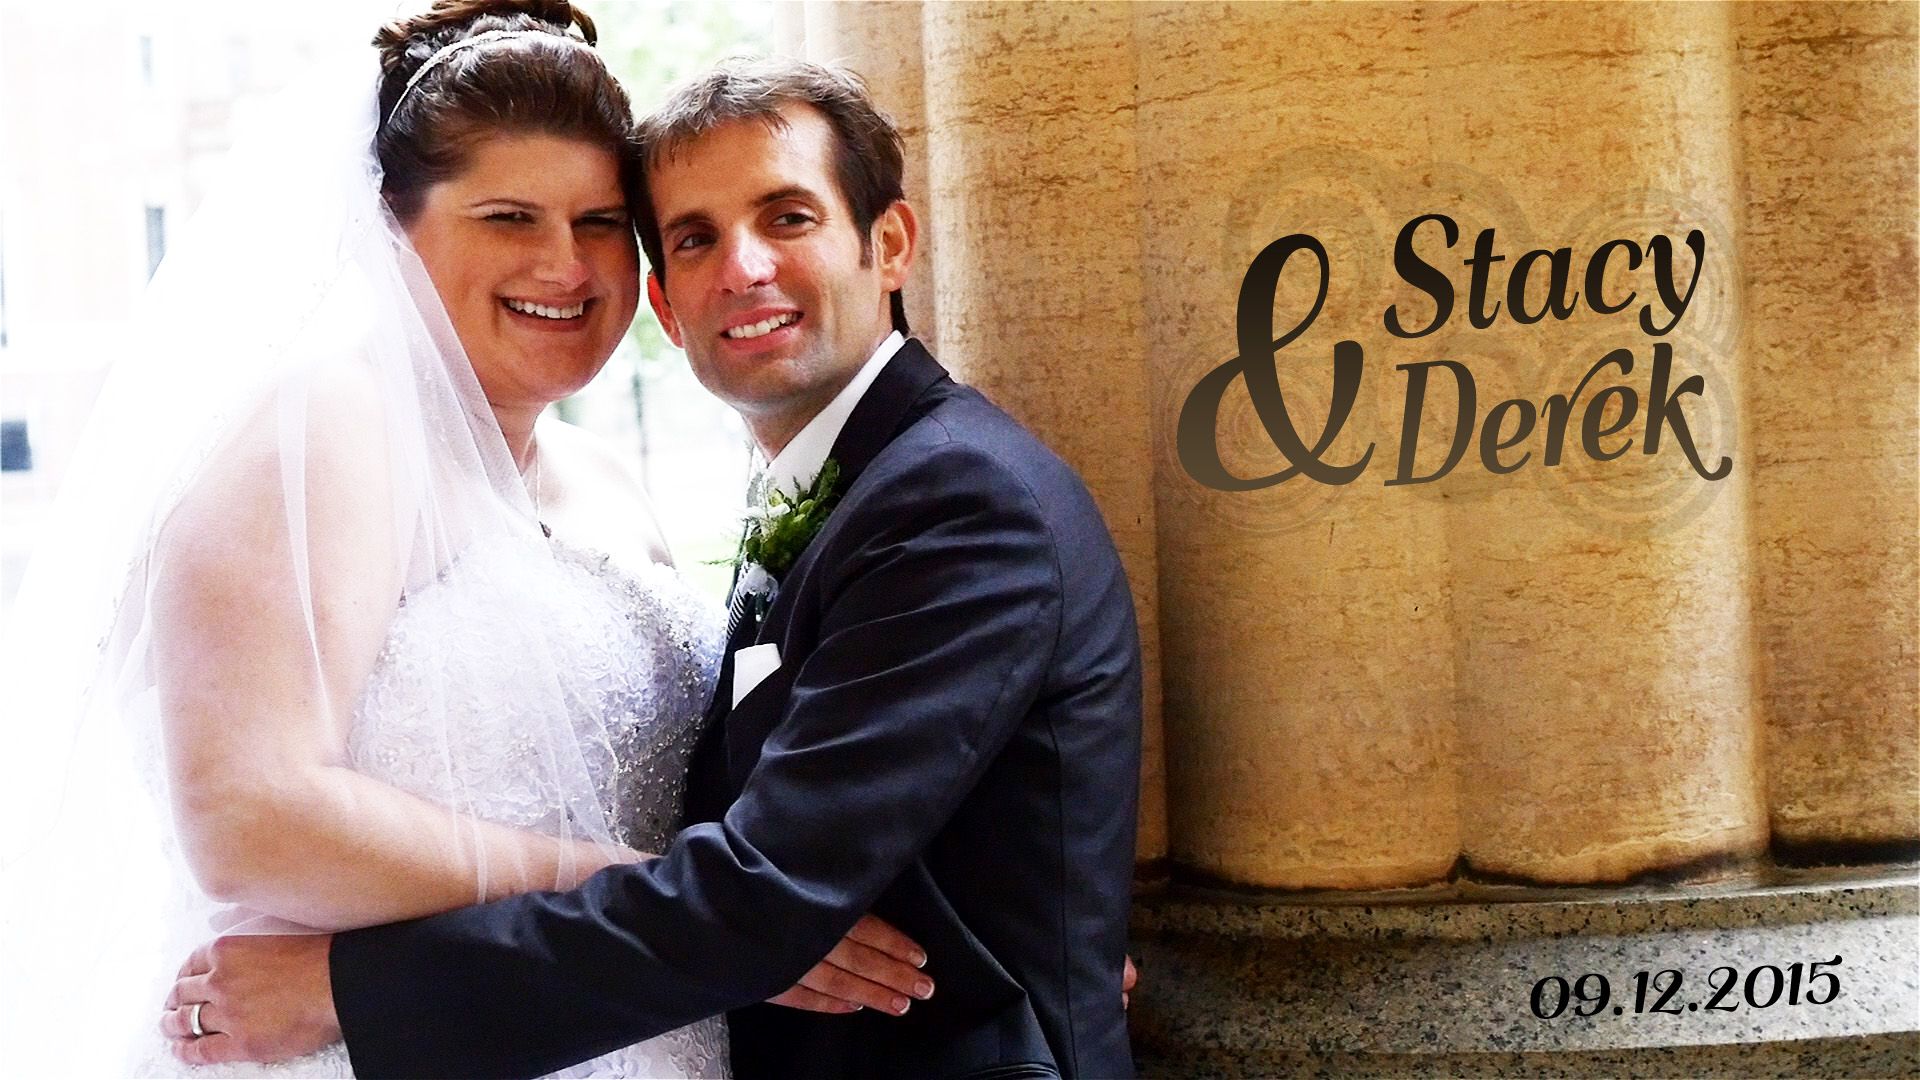 Stacy & Derek – Buffalo Wedding Video